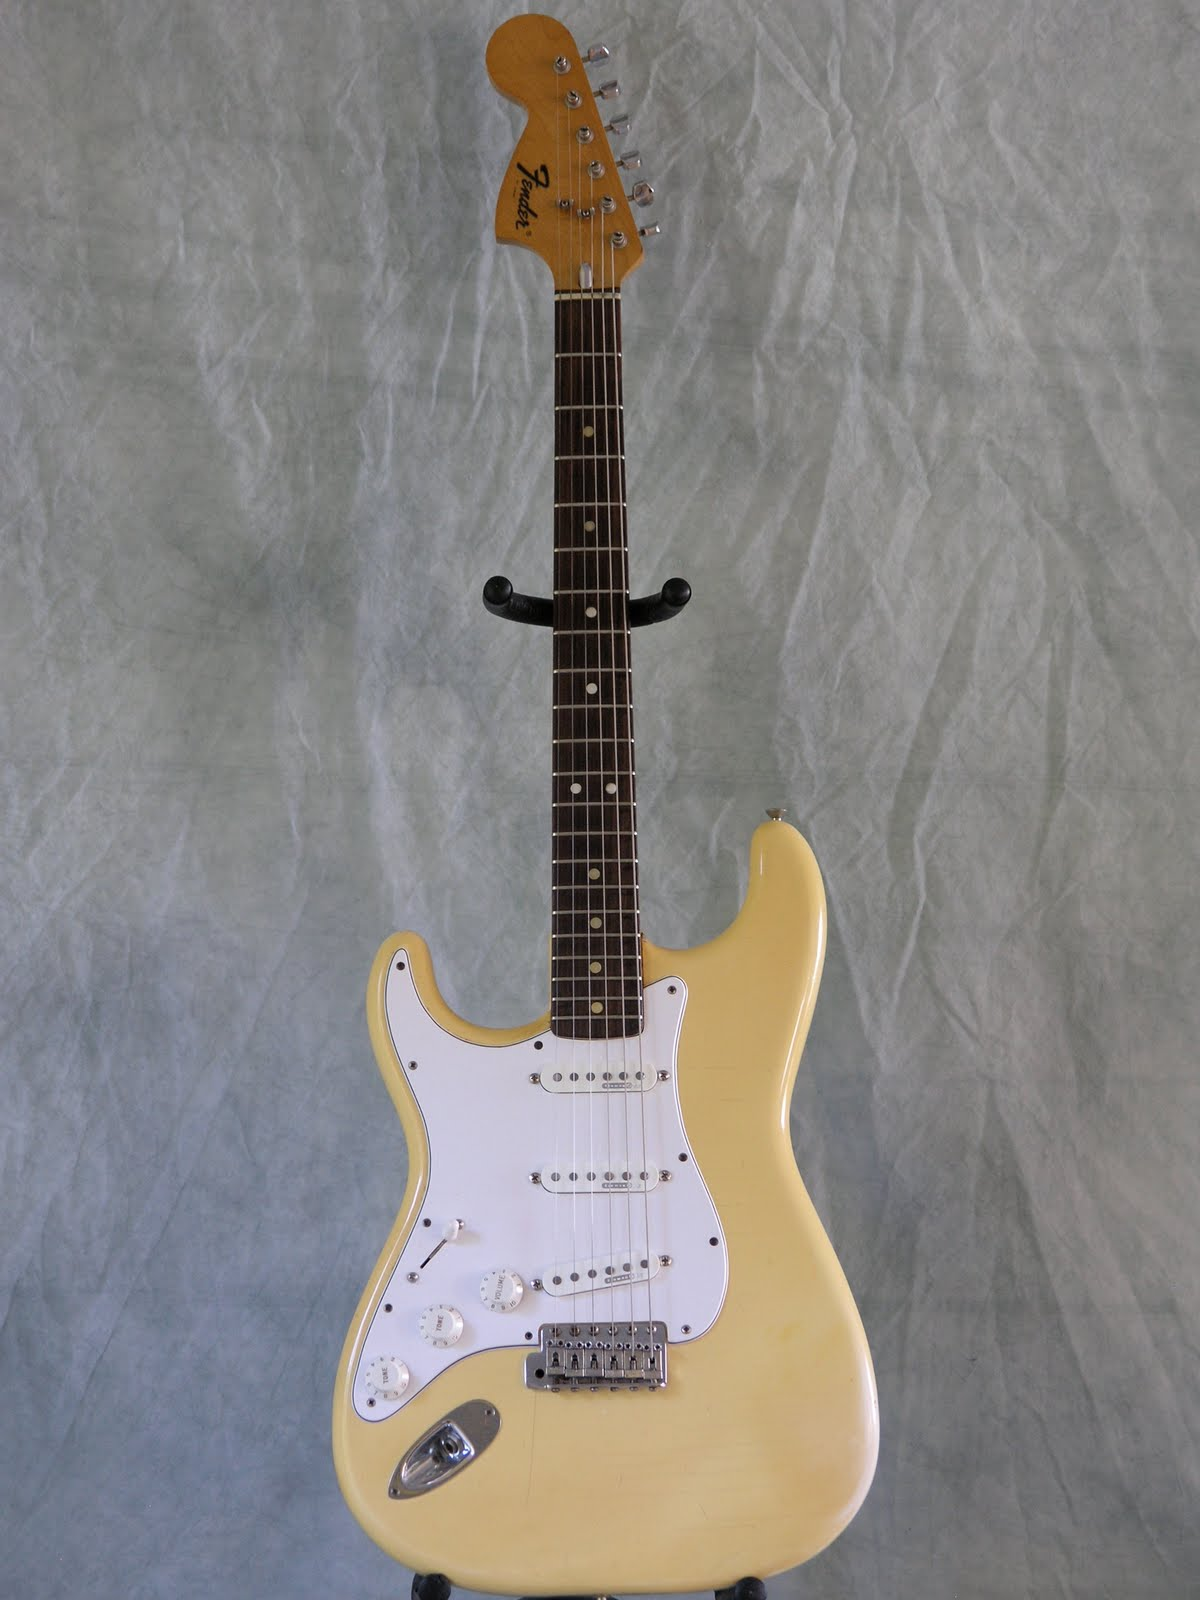 jerry 39 s lefty guitars newest guitar arrivals updated weekly 1975 fender standard strat usa. Black Bedroom Furniture Sets. Home Design Ideas